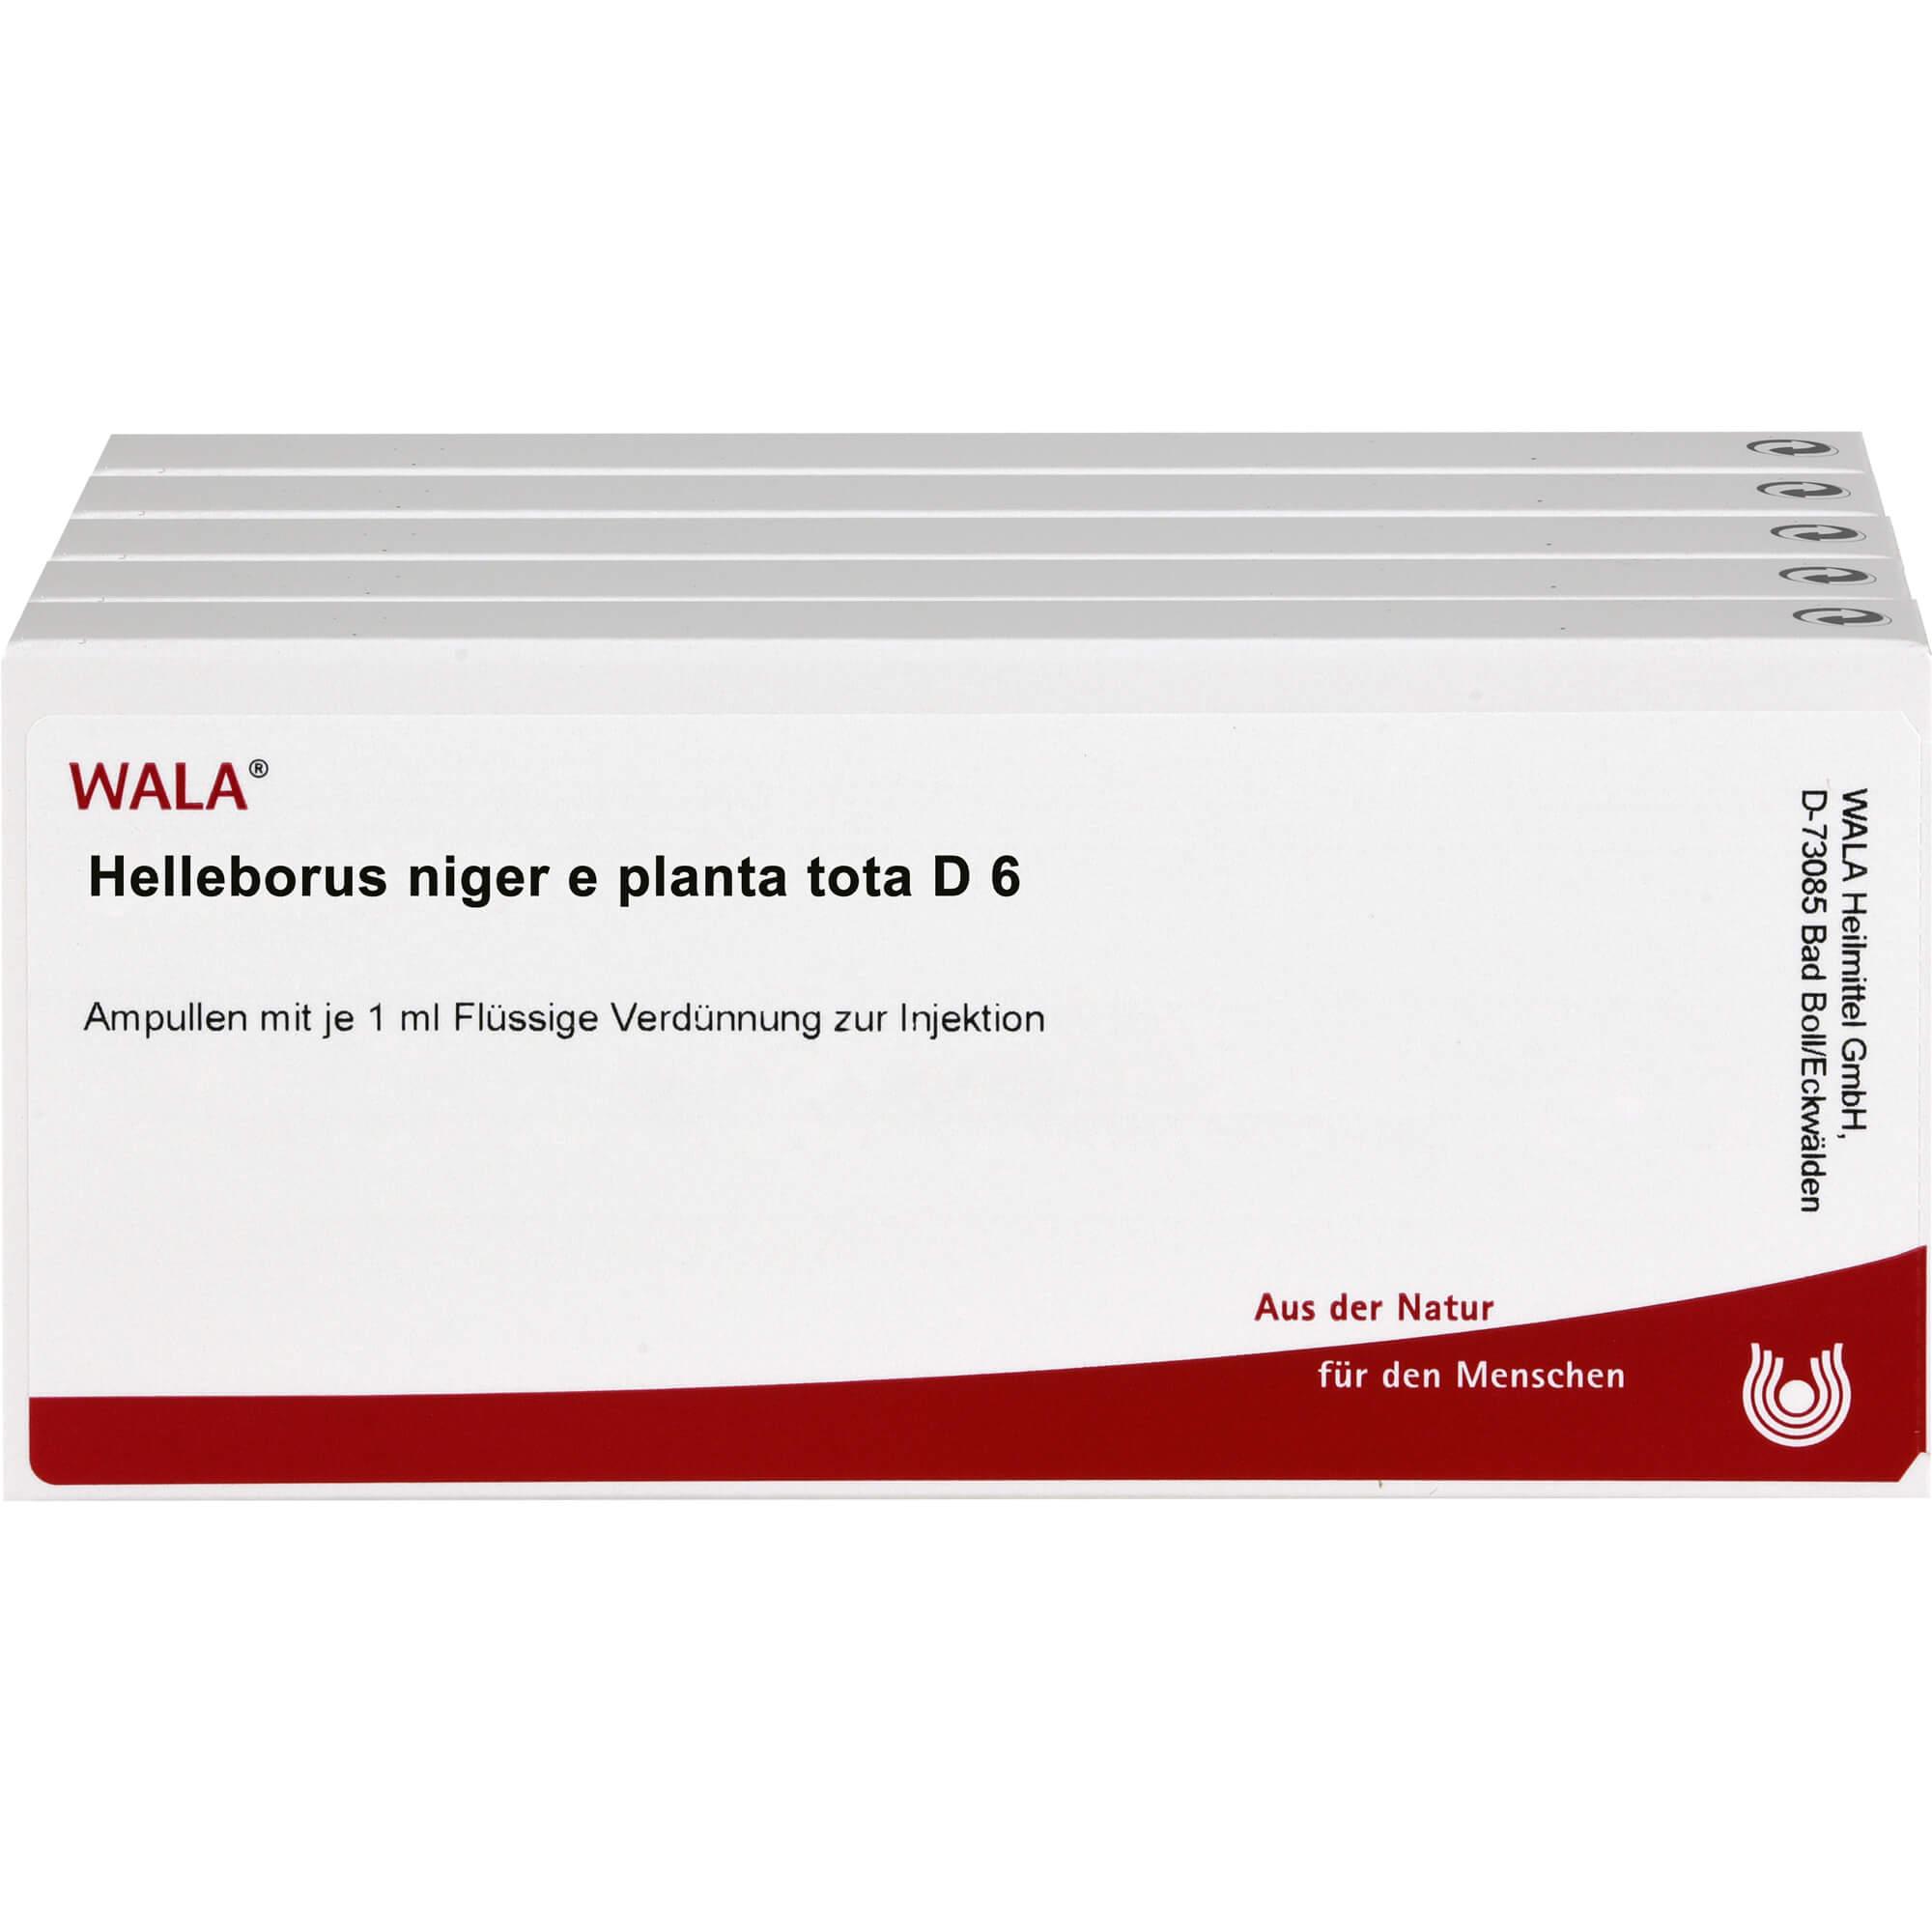 HELLEBORUS NIGER e planta tota D 6 Ampullen